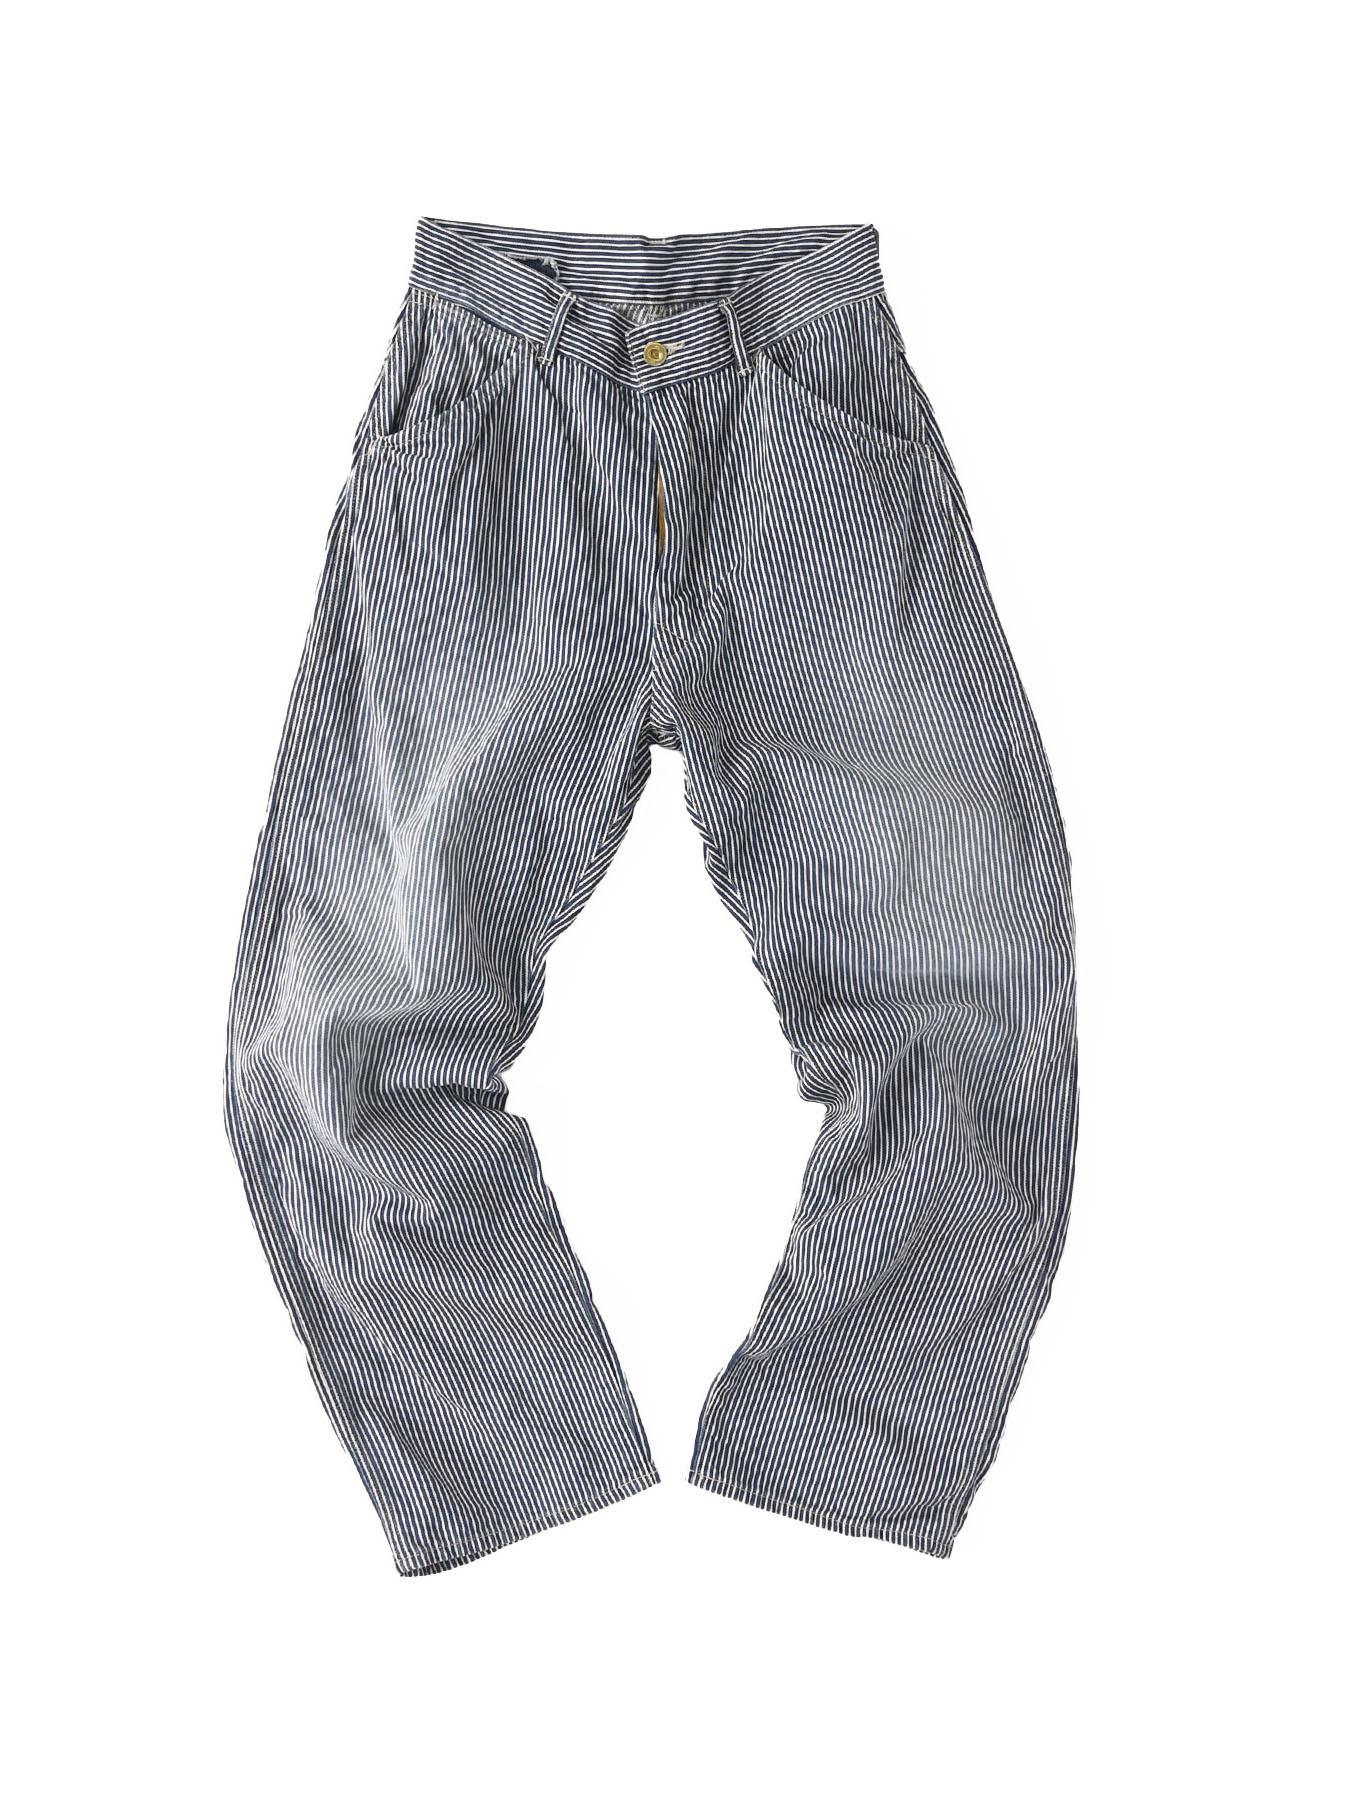 Indigo 908 Painter Pants Distressed (0721)-4